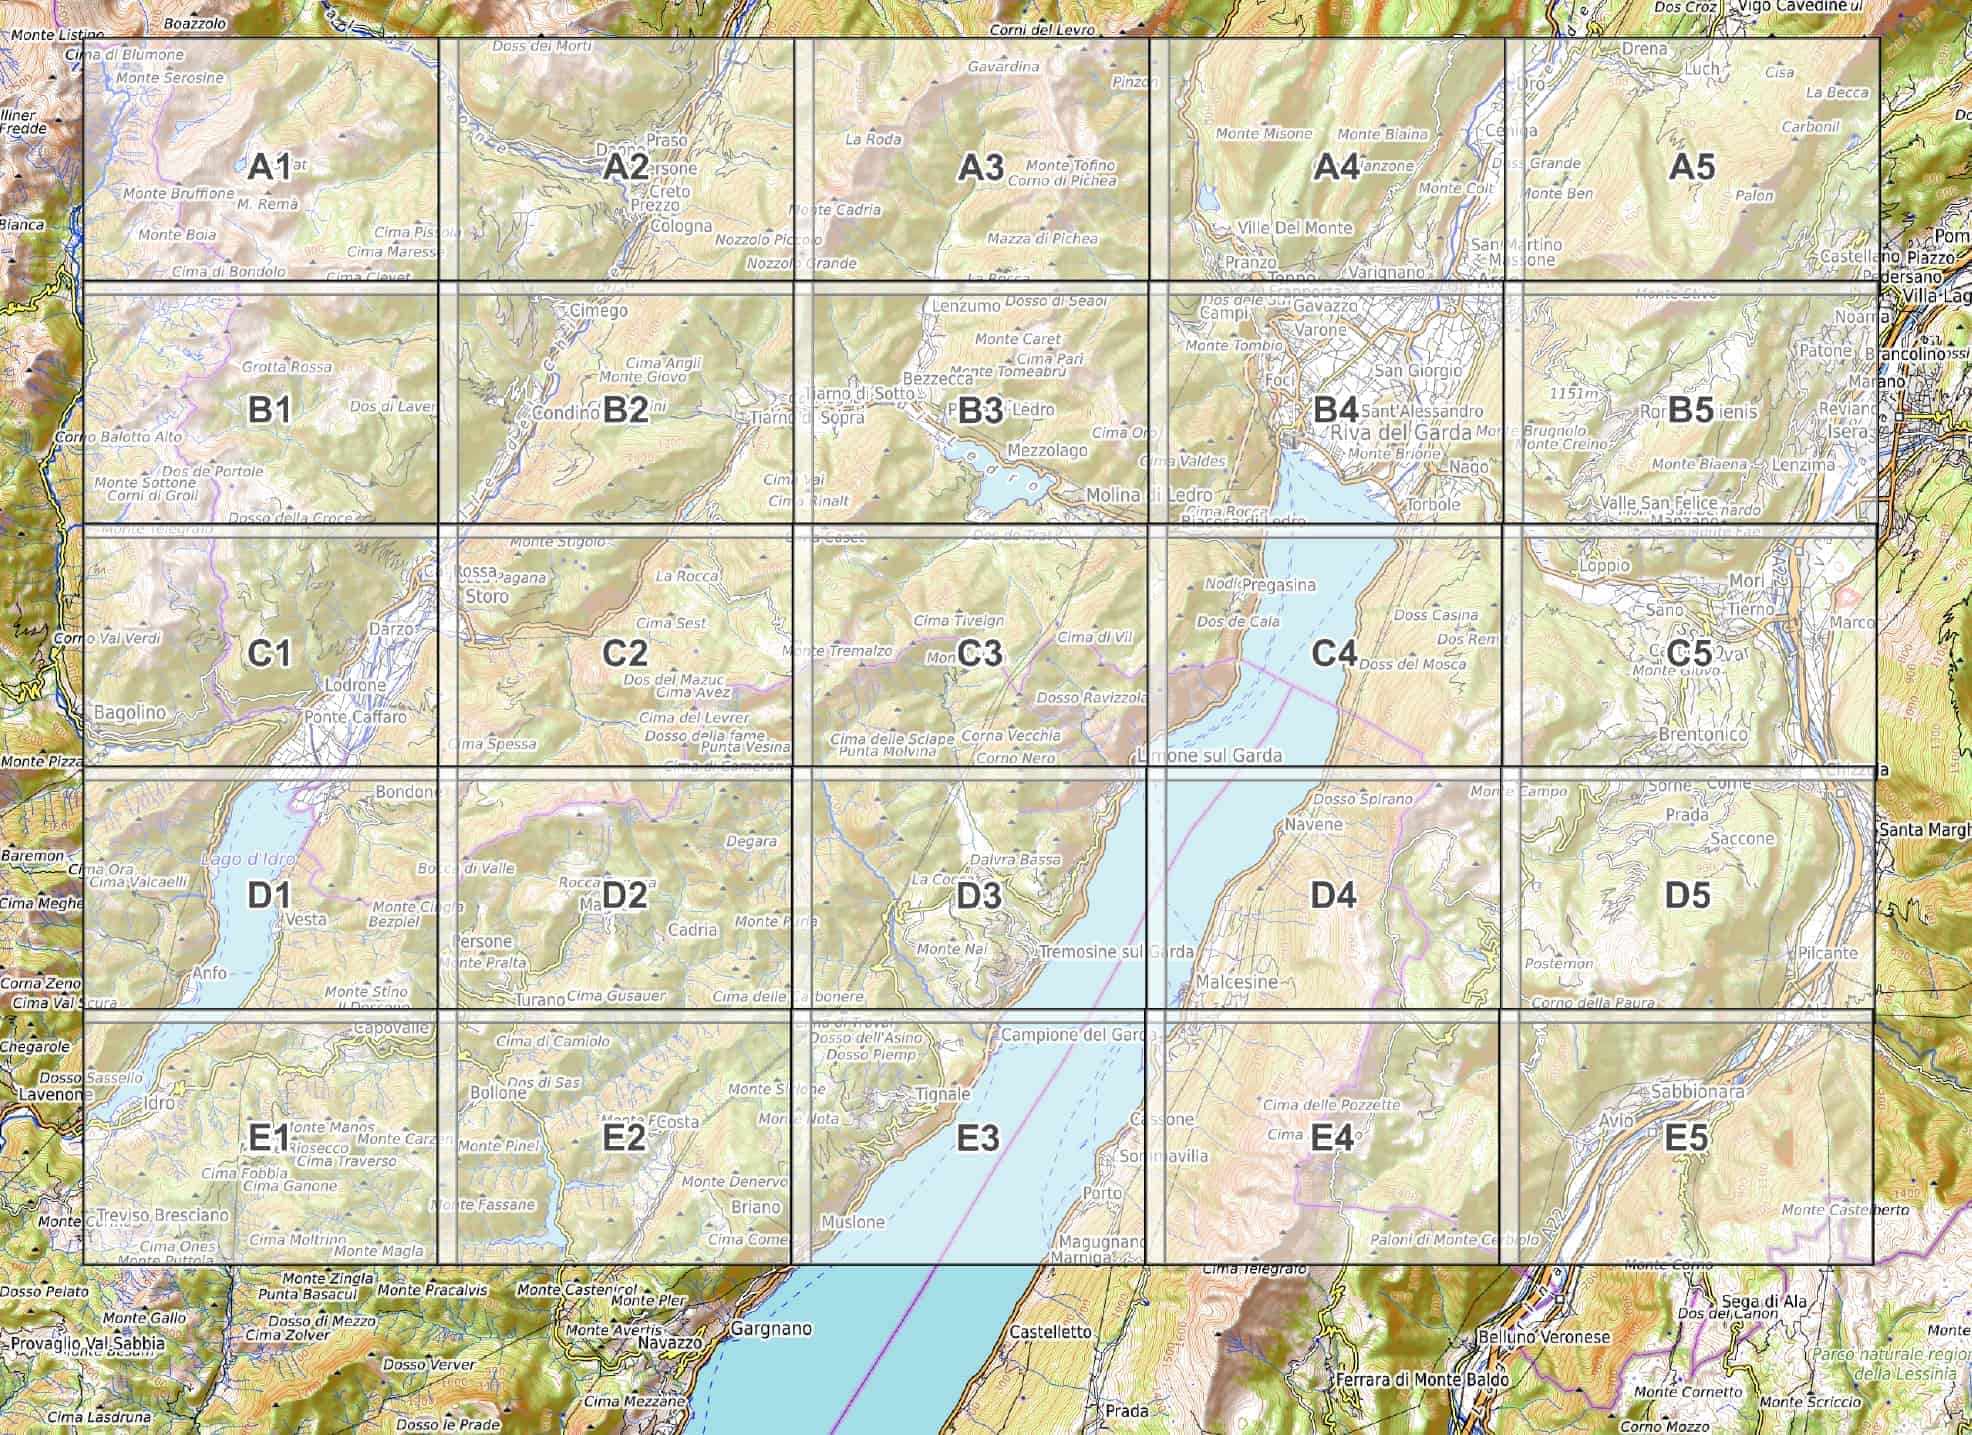 Cartina Nord.Lago Di Garda Nord Cartina Escursionistica Pdf Da Scaricare 1 33 000 Wanderndeluxe